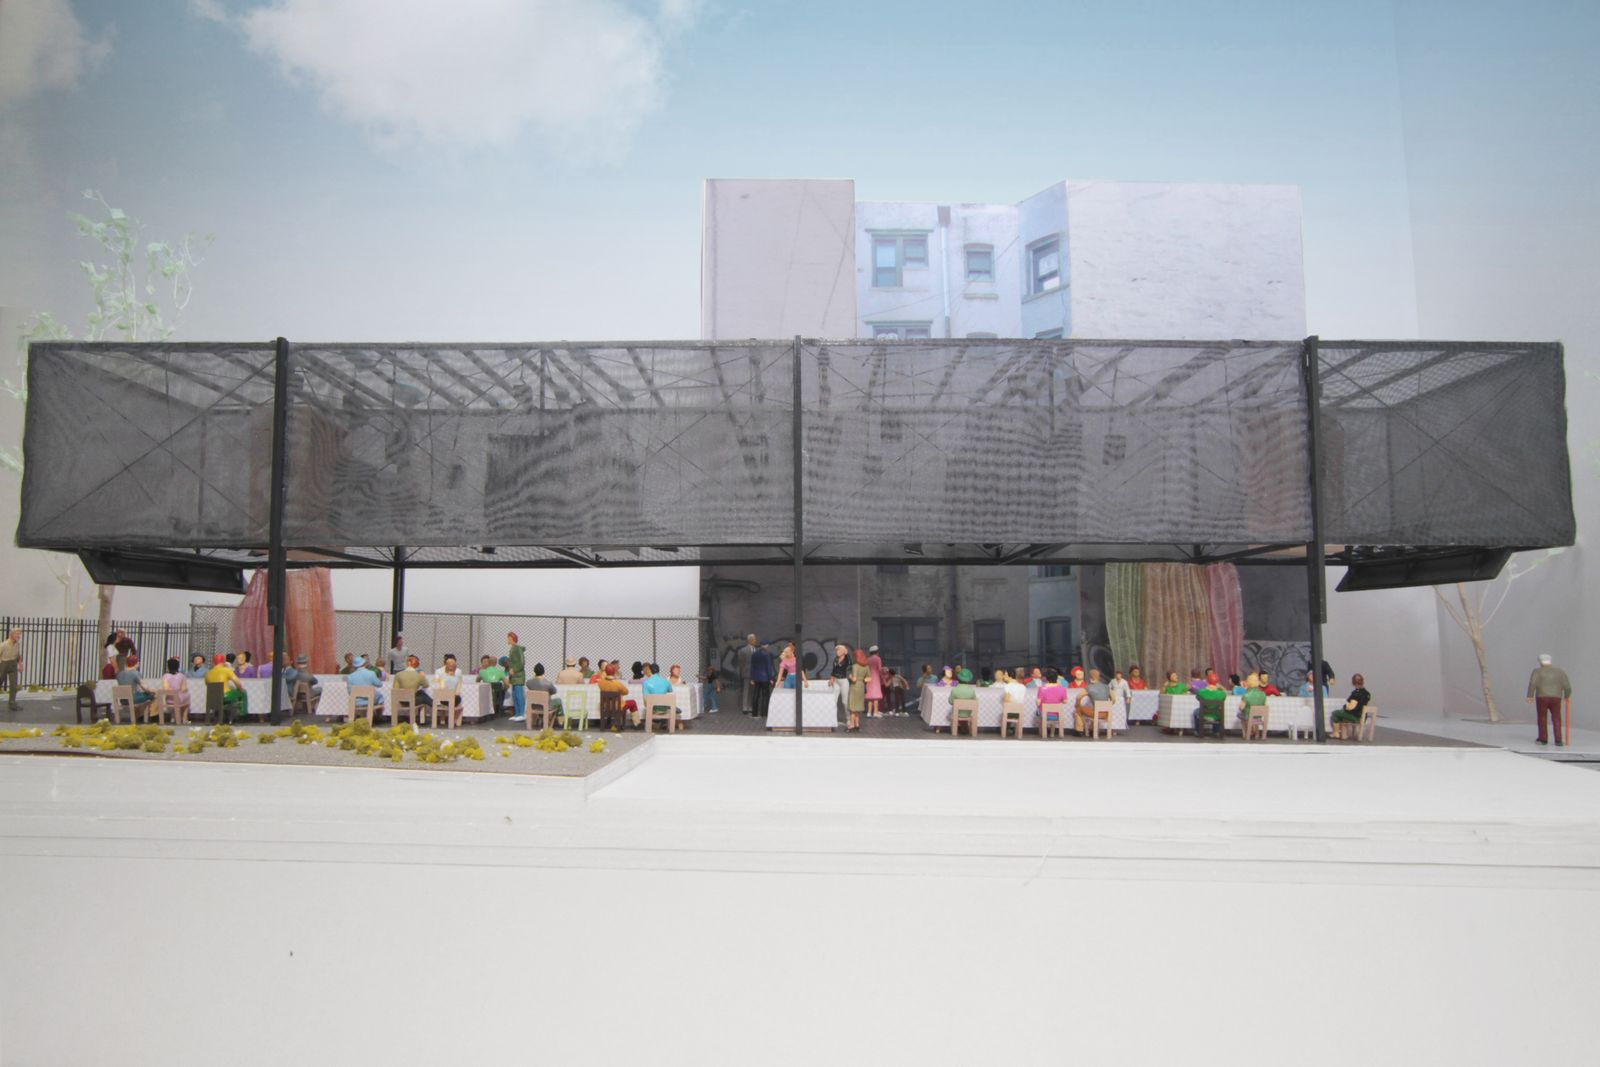 Architekturmodell BMW Guggenheim Lab